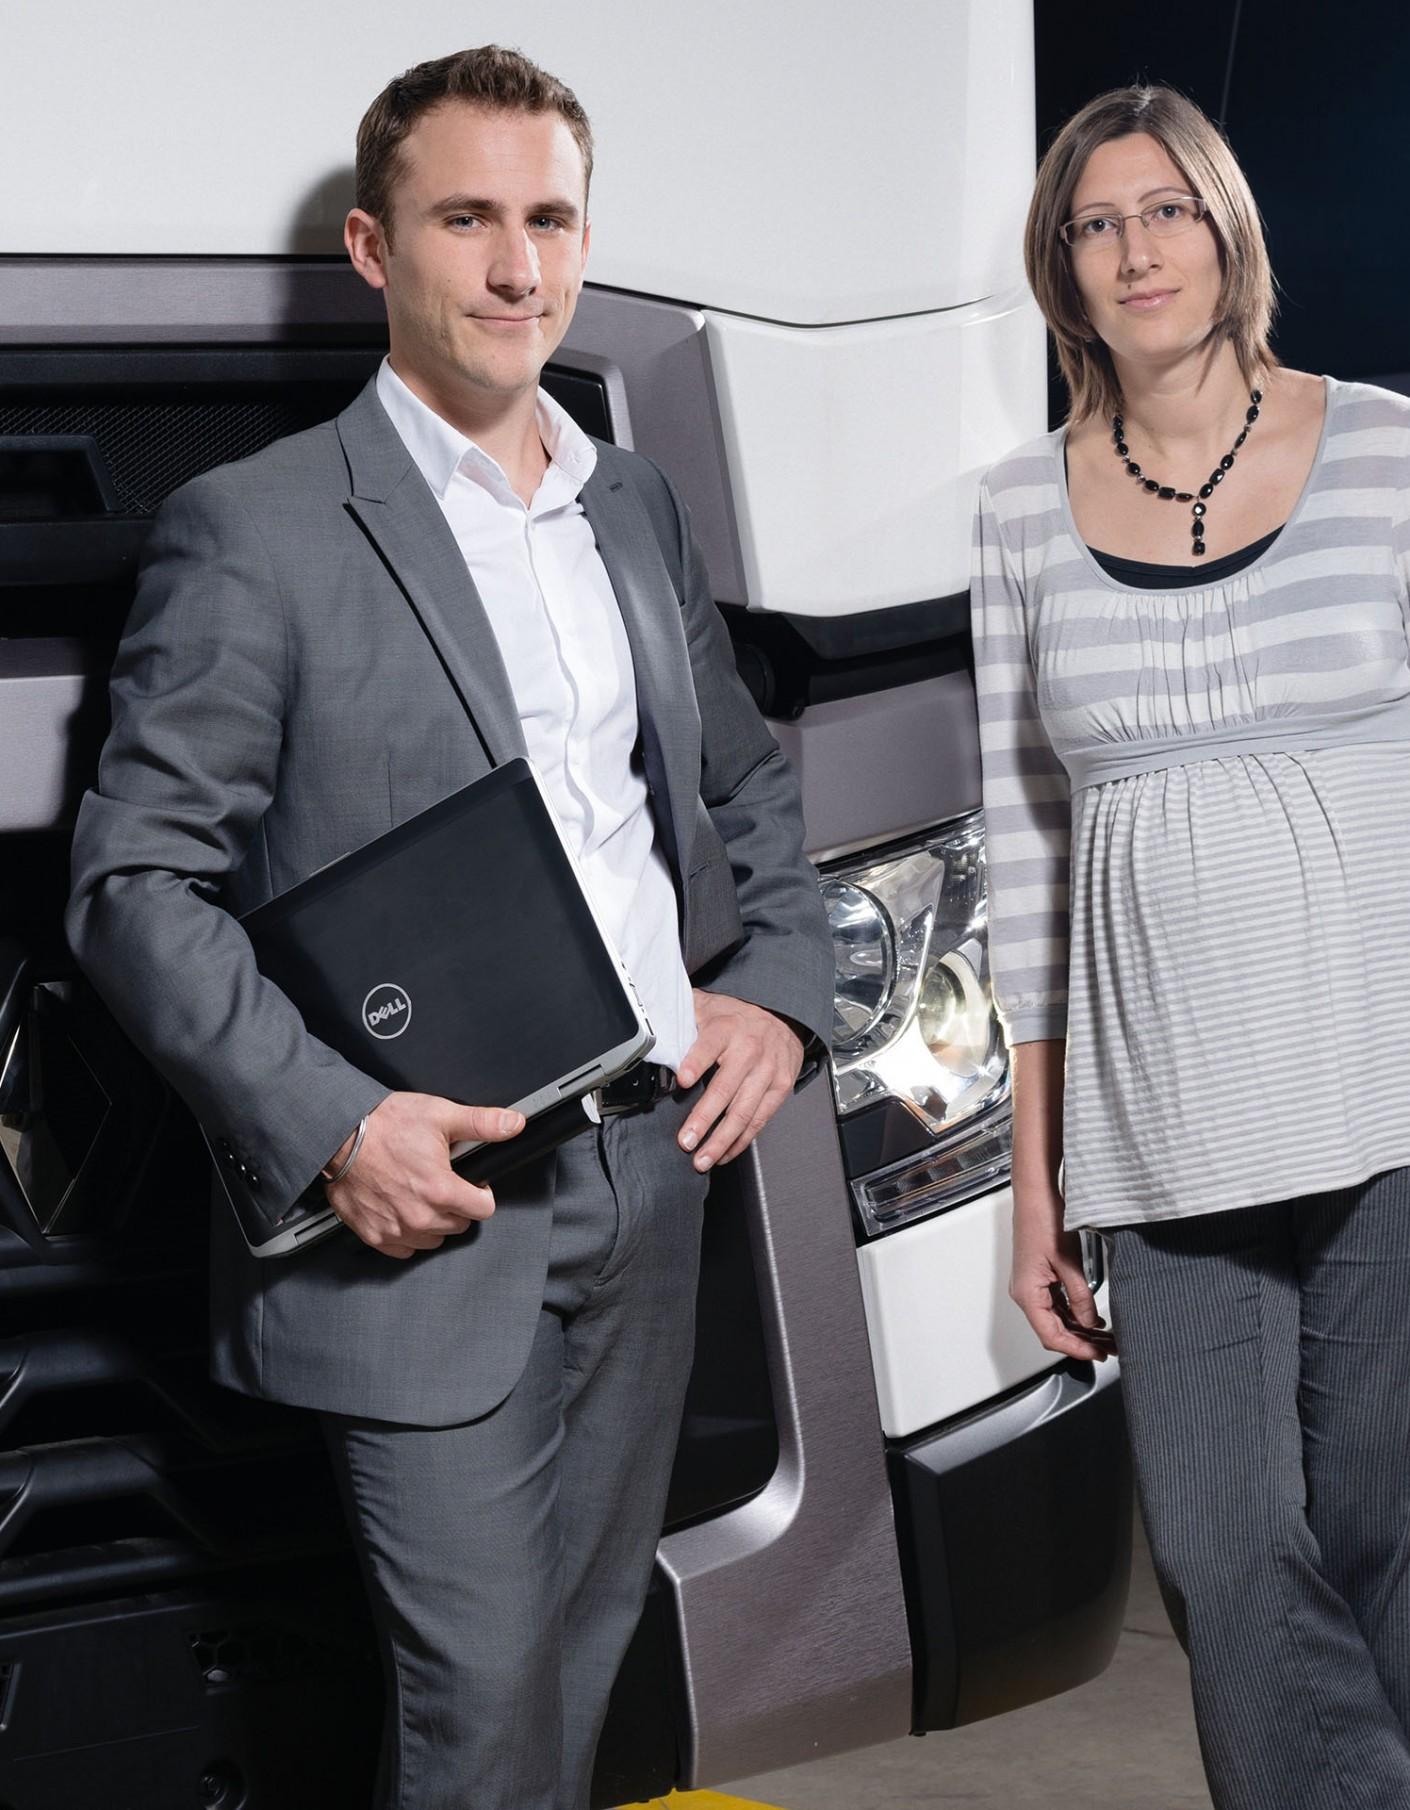 Renault Trucks Magazine - The Project - novembre 2013